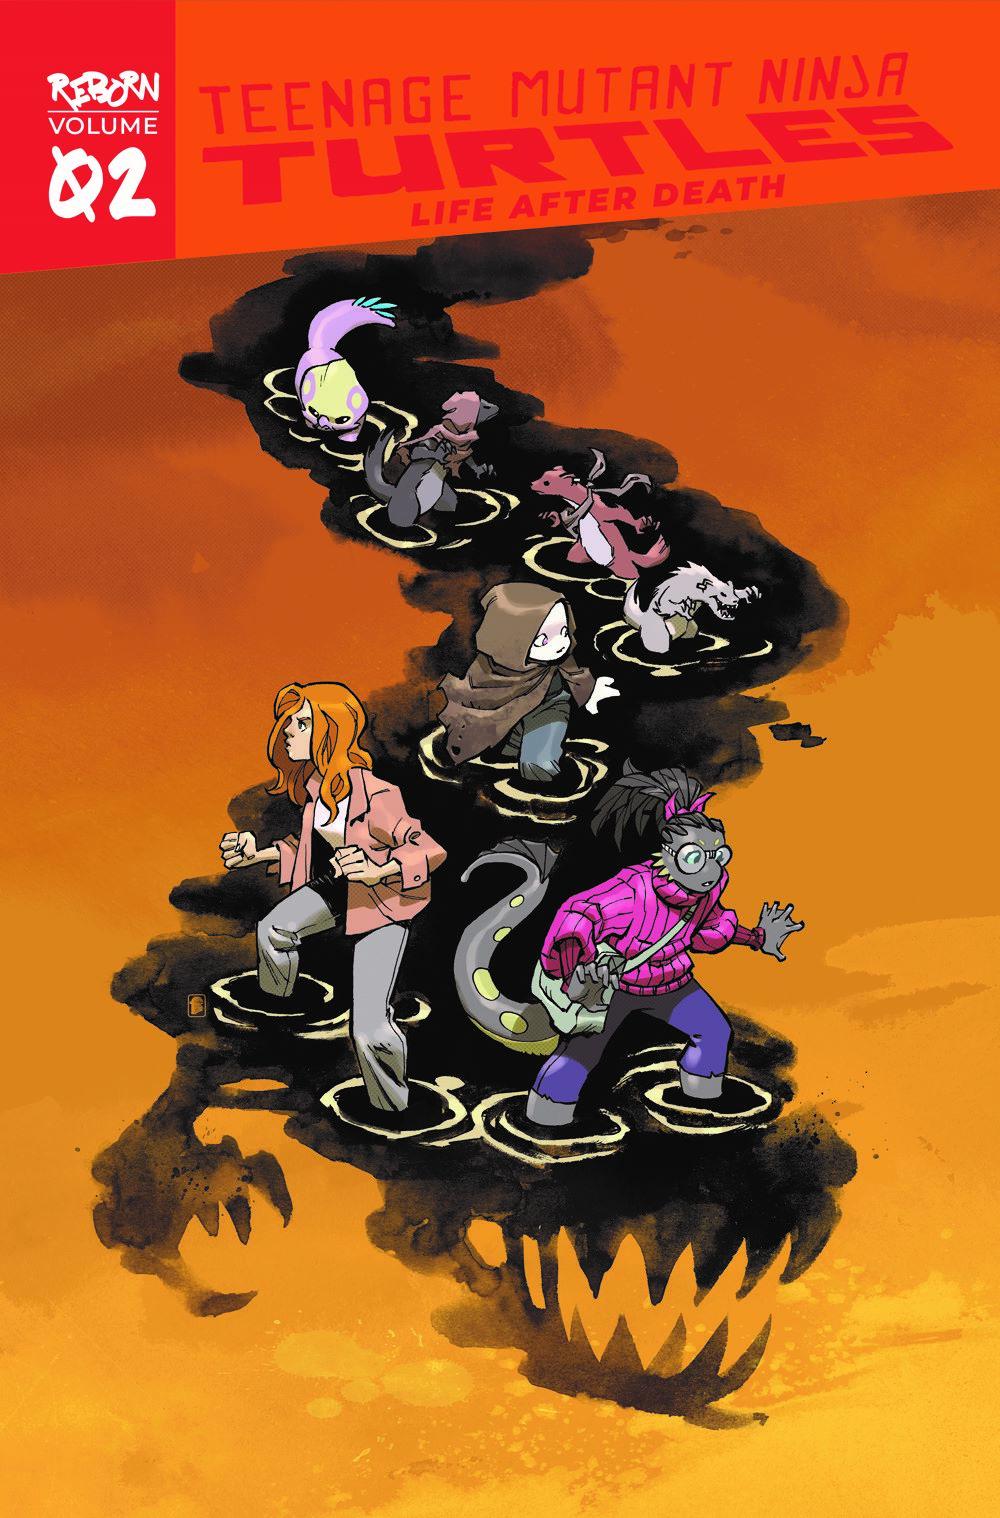 TMNT-Reborn02_cvr ComicList Previews: TEENAGE MUTANT NINJA TURTLES REBORN VOLUME 2 LIFE AFTER DEATH TP